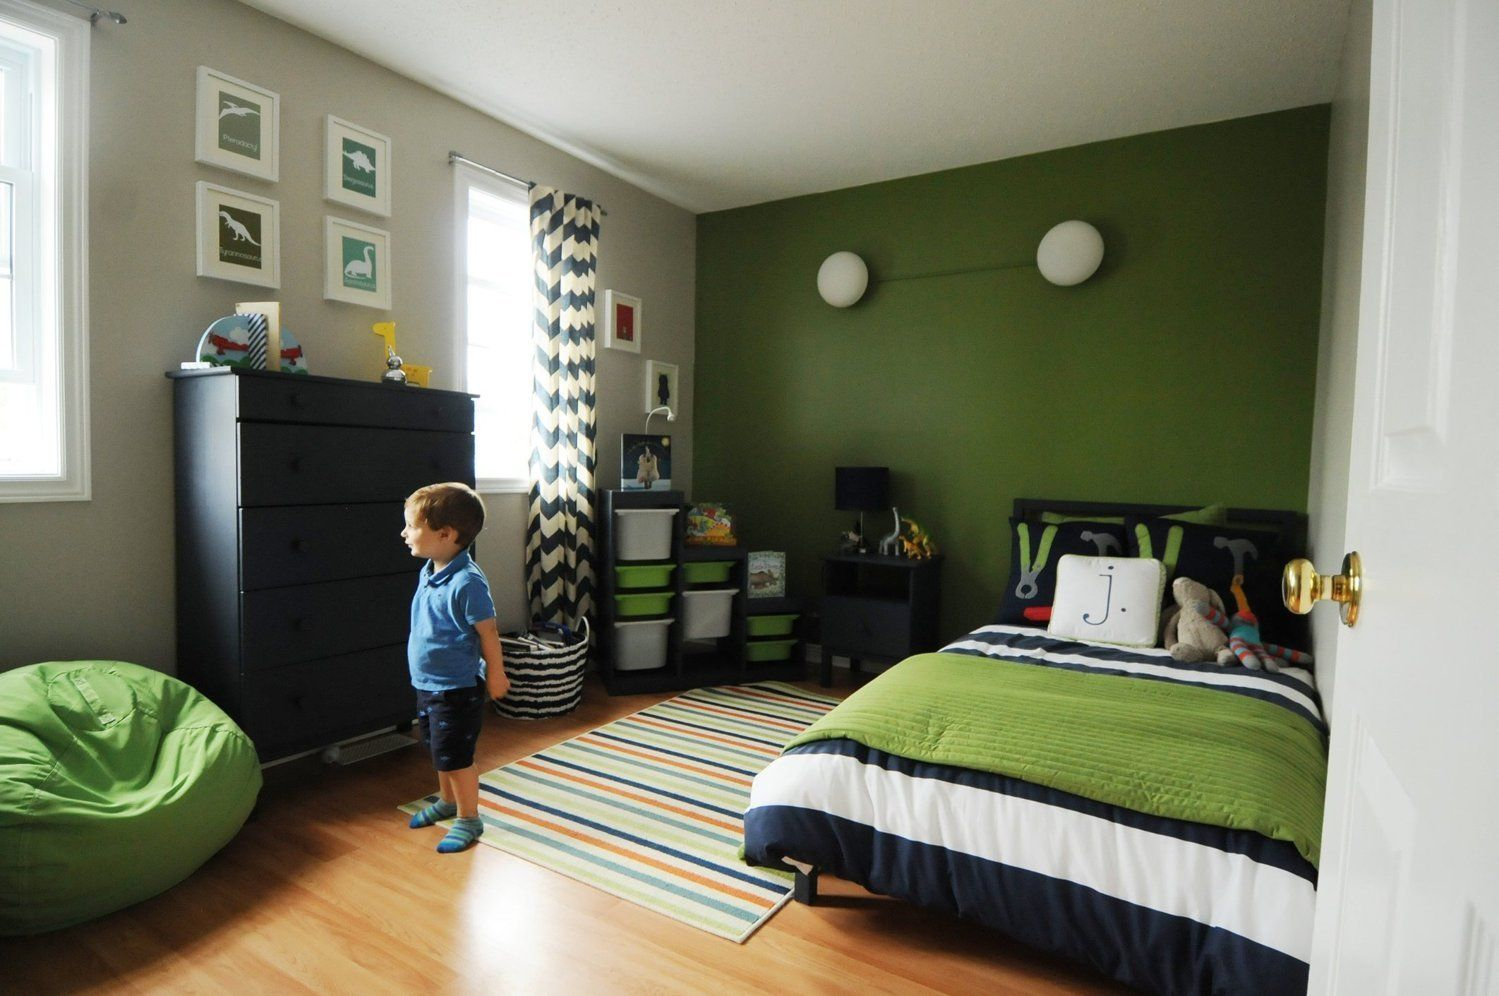 Joseph S Champagne Toddler Room On A Beer Budget Green Boys Room Big Boy Room Bedroom Green